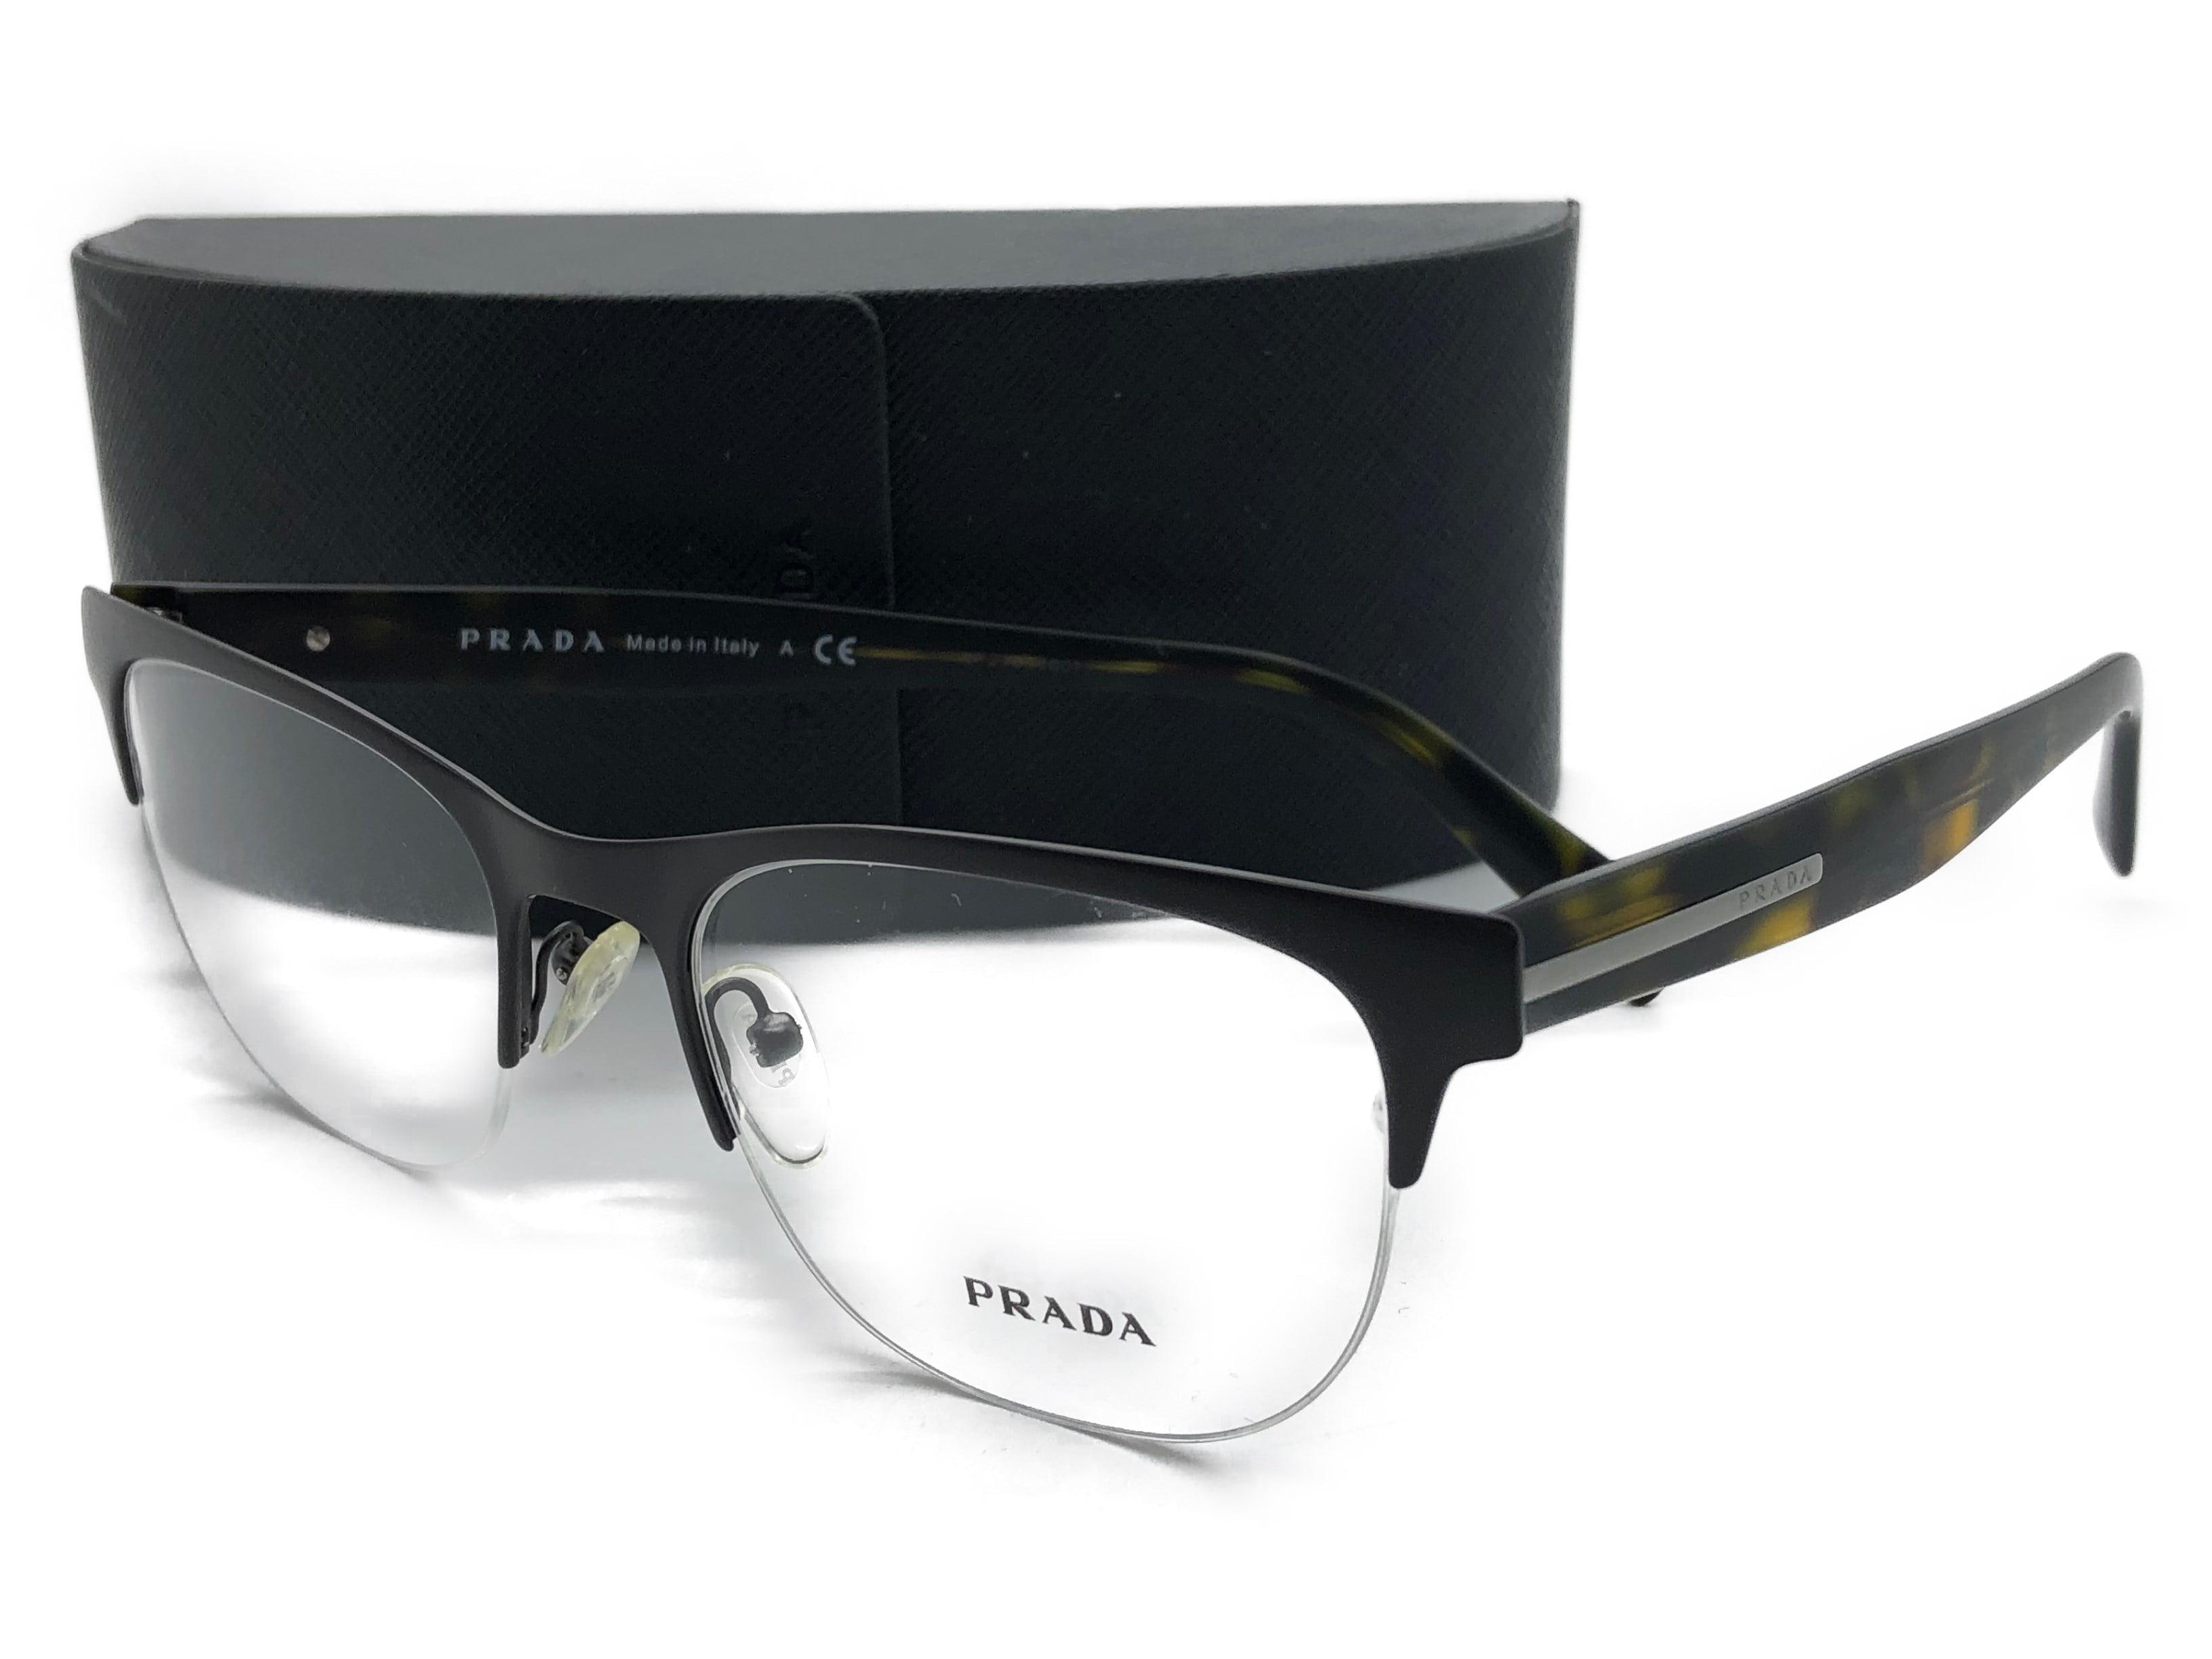 fc9b5c276e87 Prada Brown Tortoise Frame Semi Rimless Eyeglasses 53mm Vpr 54r Lah-1o1 -  Walmart.com